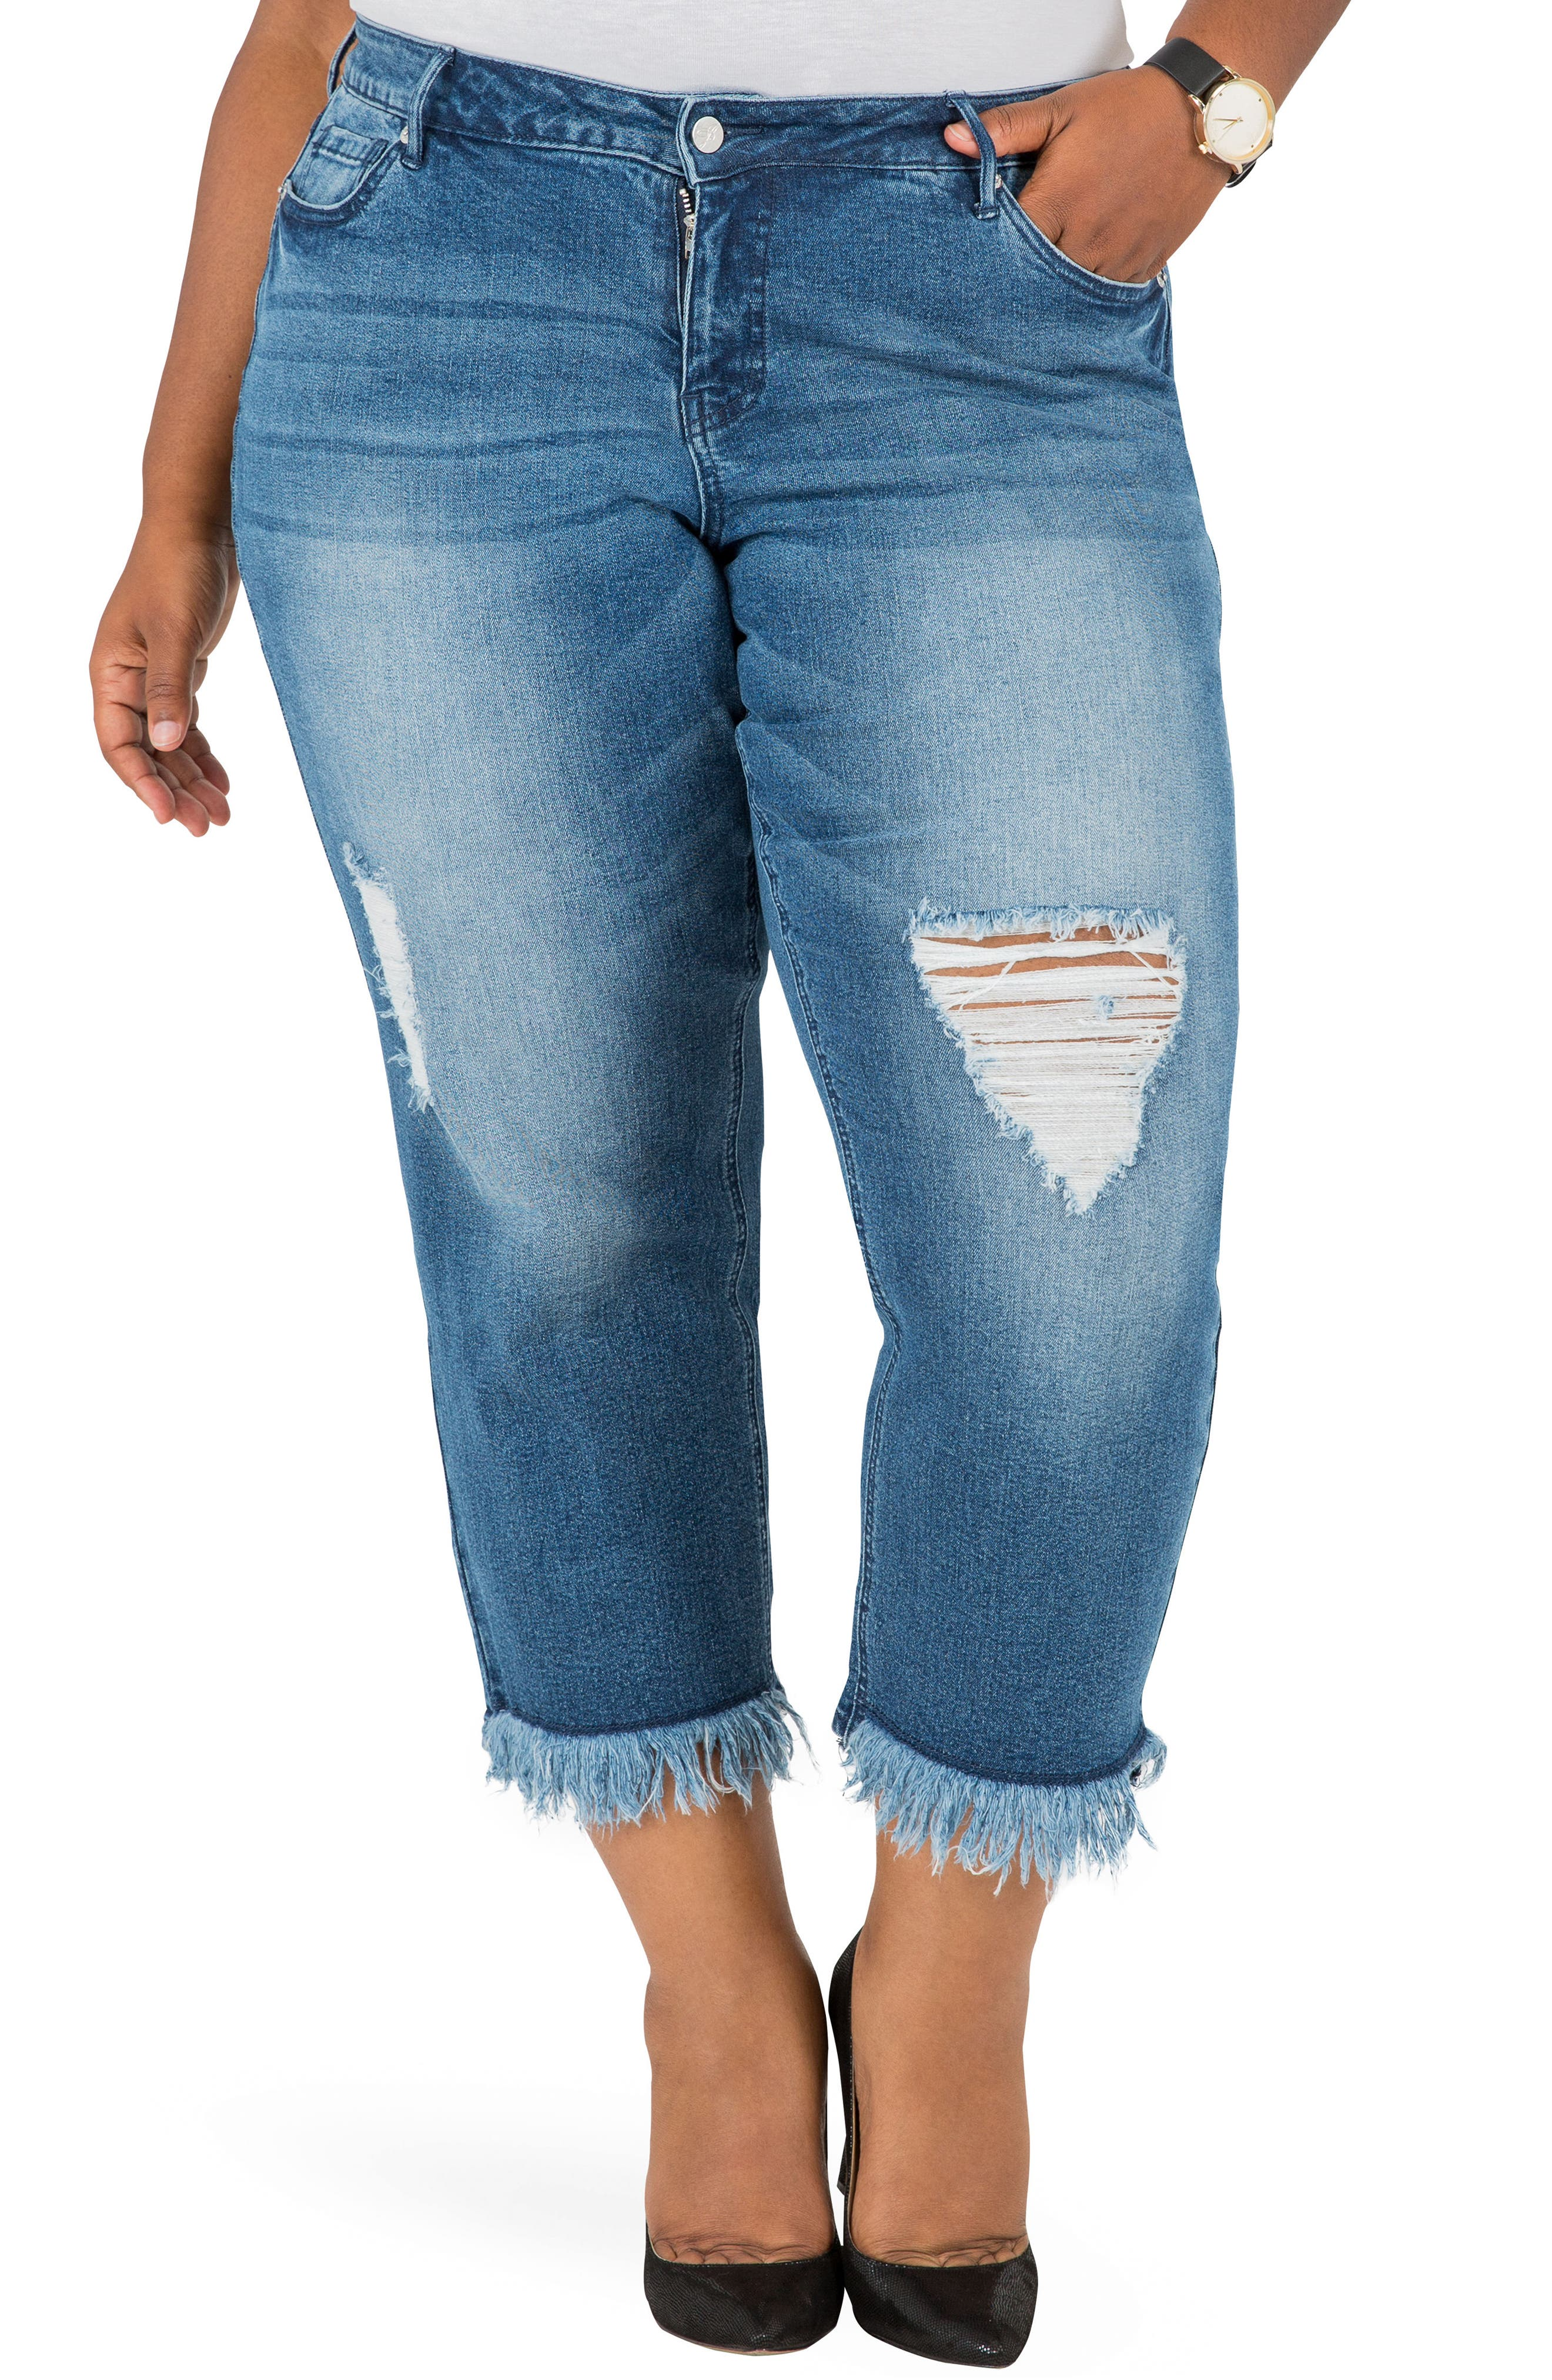 POETIC JUSTICE Verla Frayed Hem Crop Boyfriend Jeans, Main, color, LIGHT BLUE